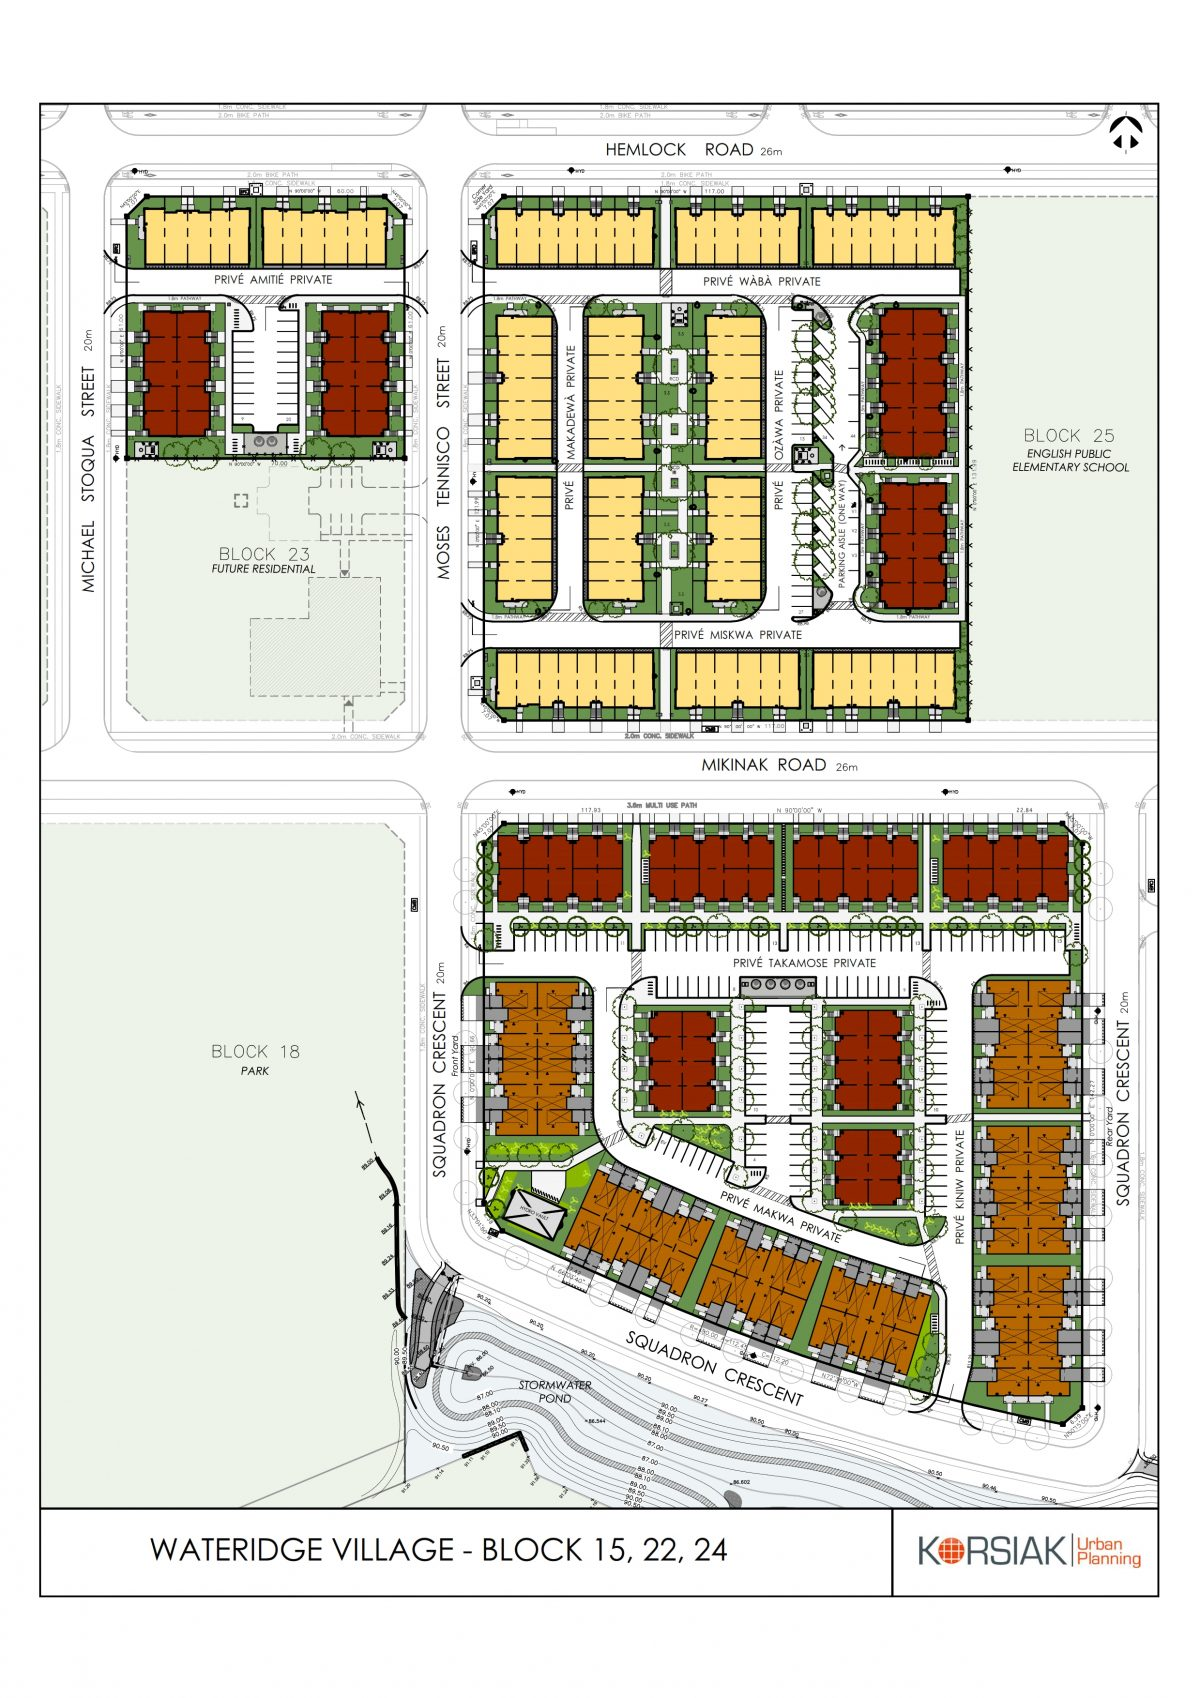 Korsiak Urban Planning - Ottawa Portfolio - Wateridge Village, Greenfield Development - Ottawa, Ontario